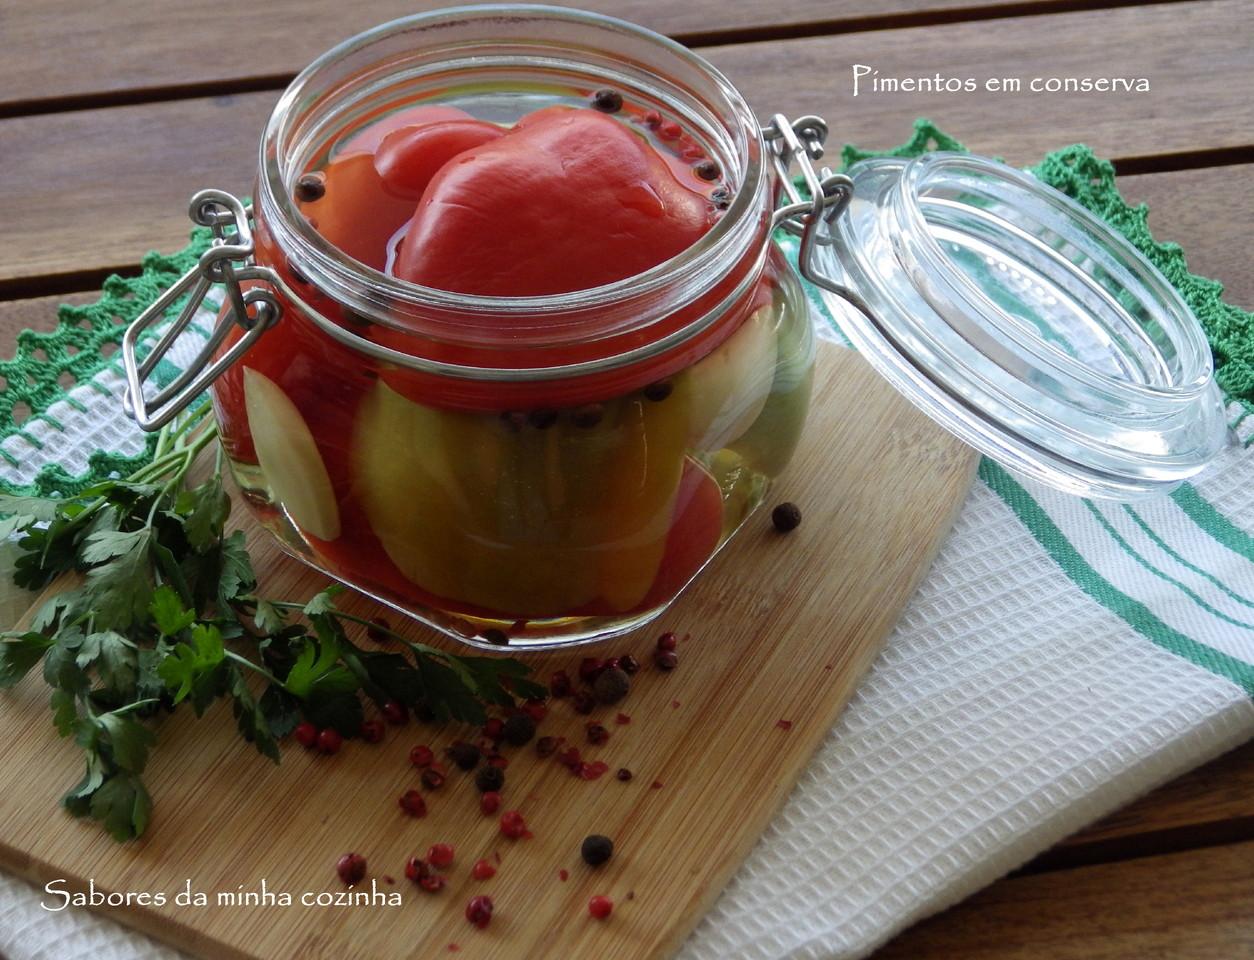 IMGP5323-Pimentos em conserva-Blog.JPG